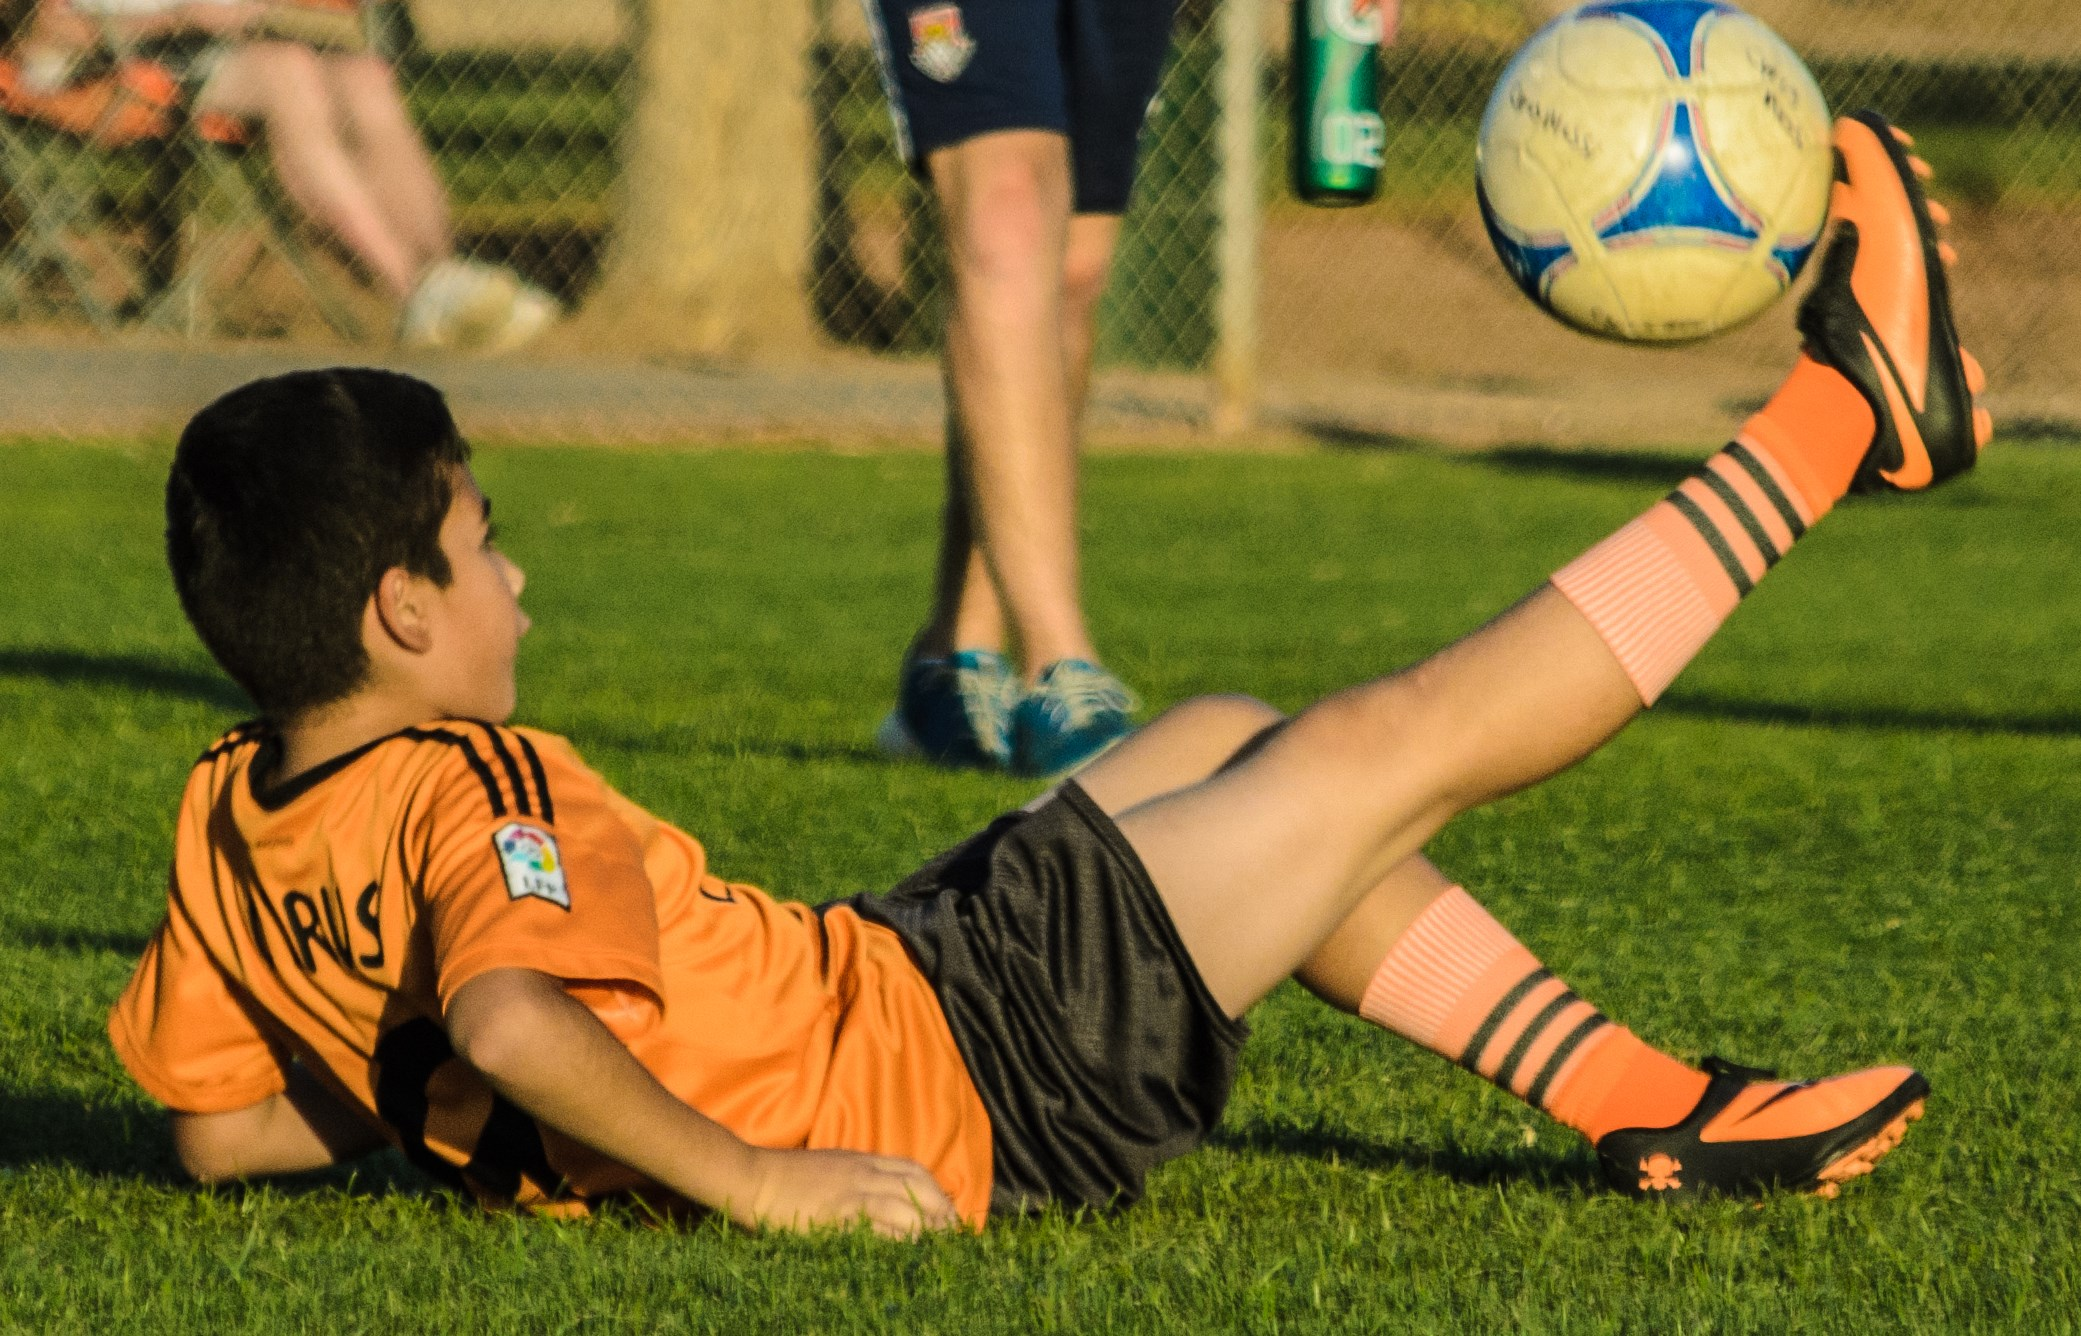 Just Kicking it!